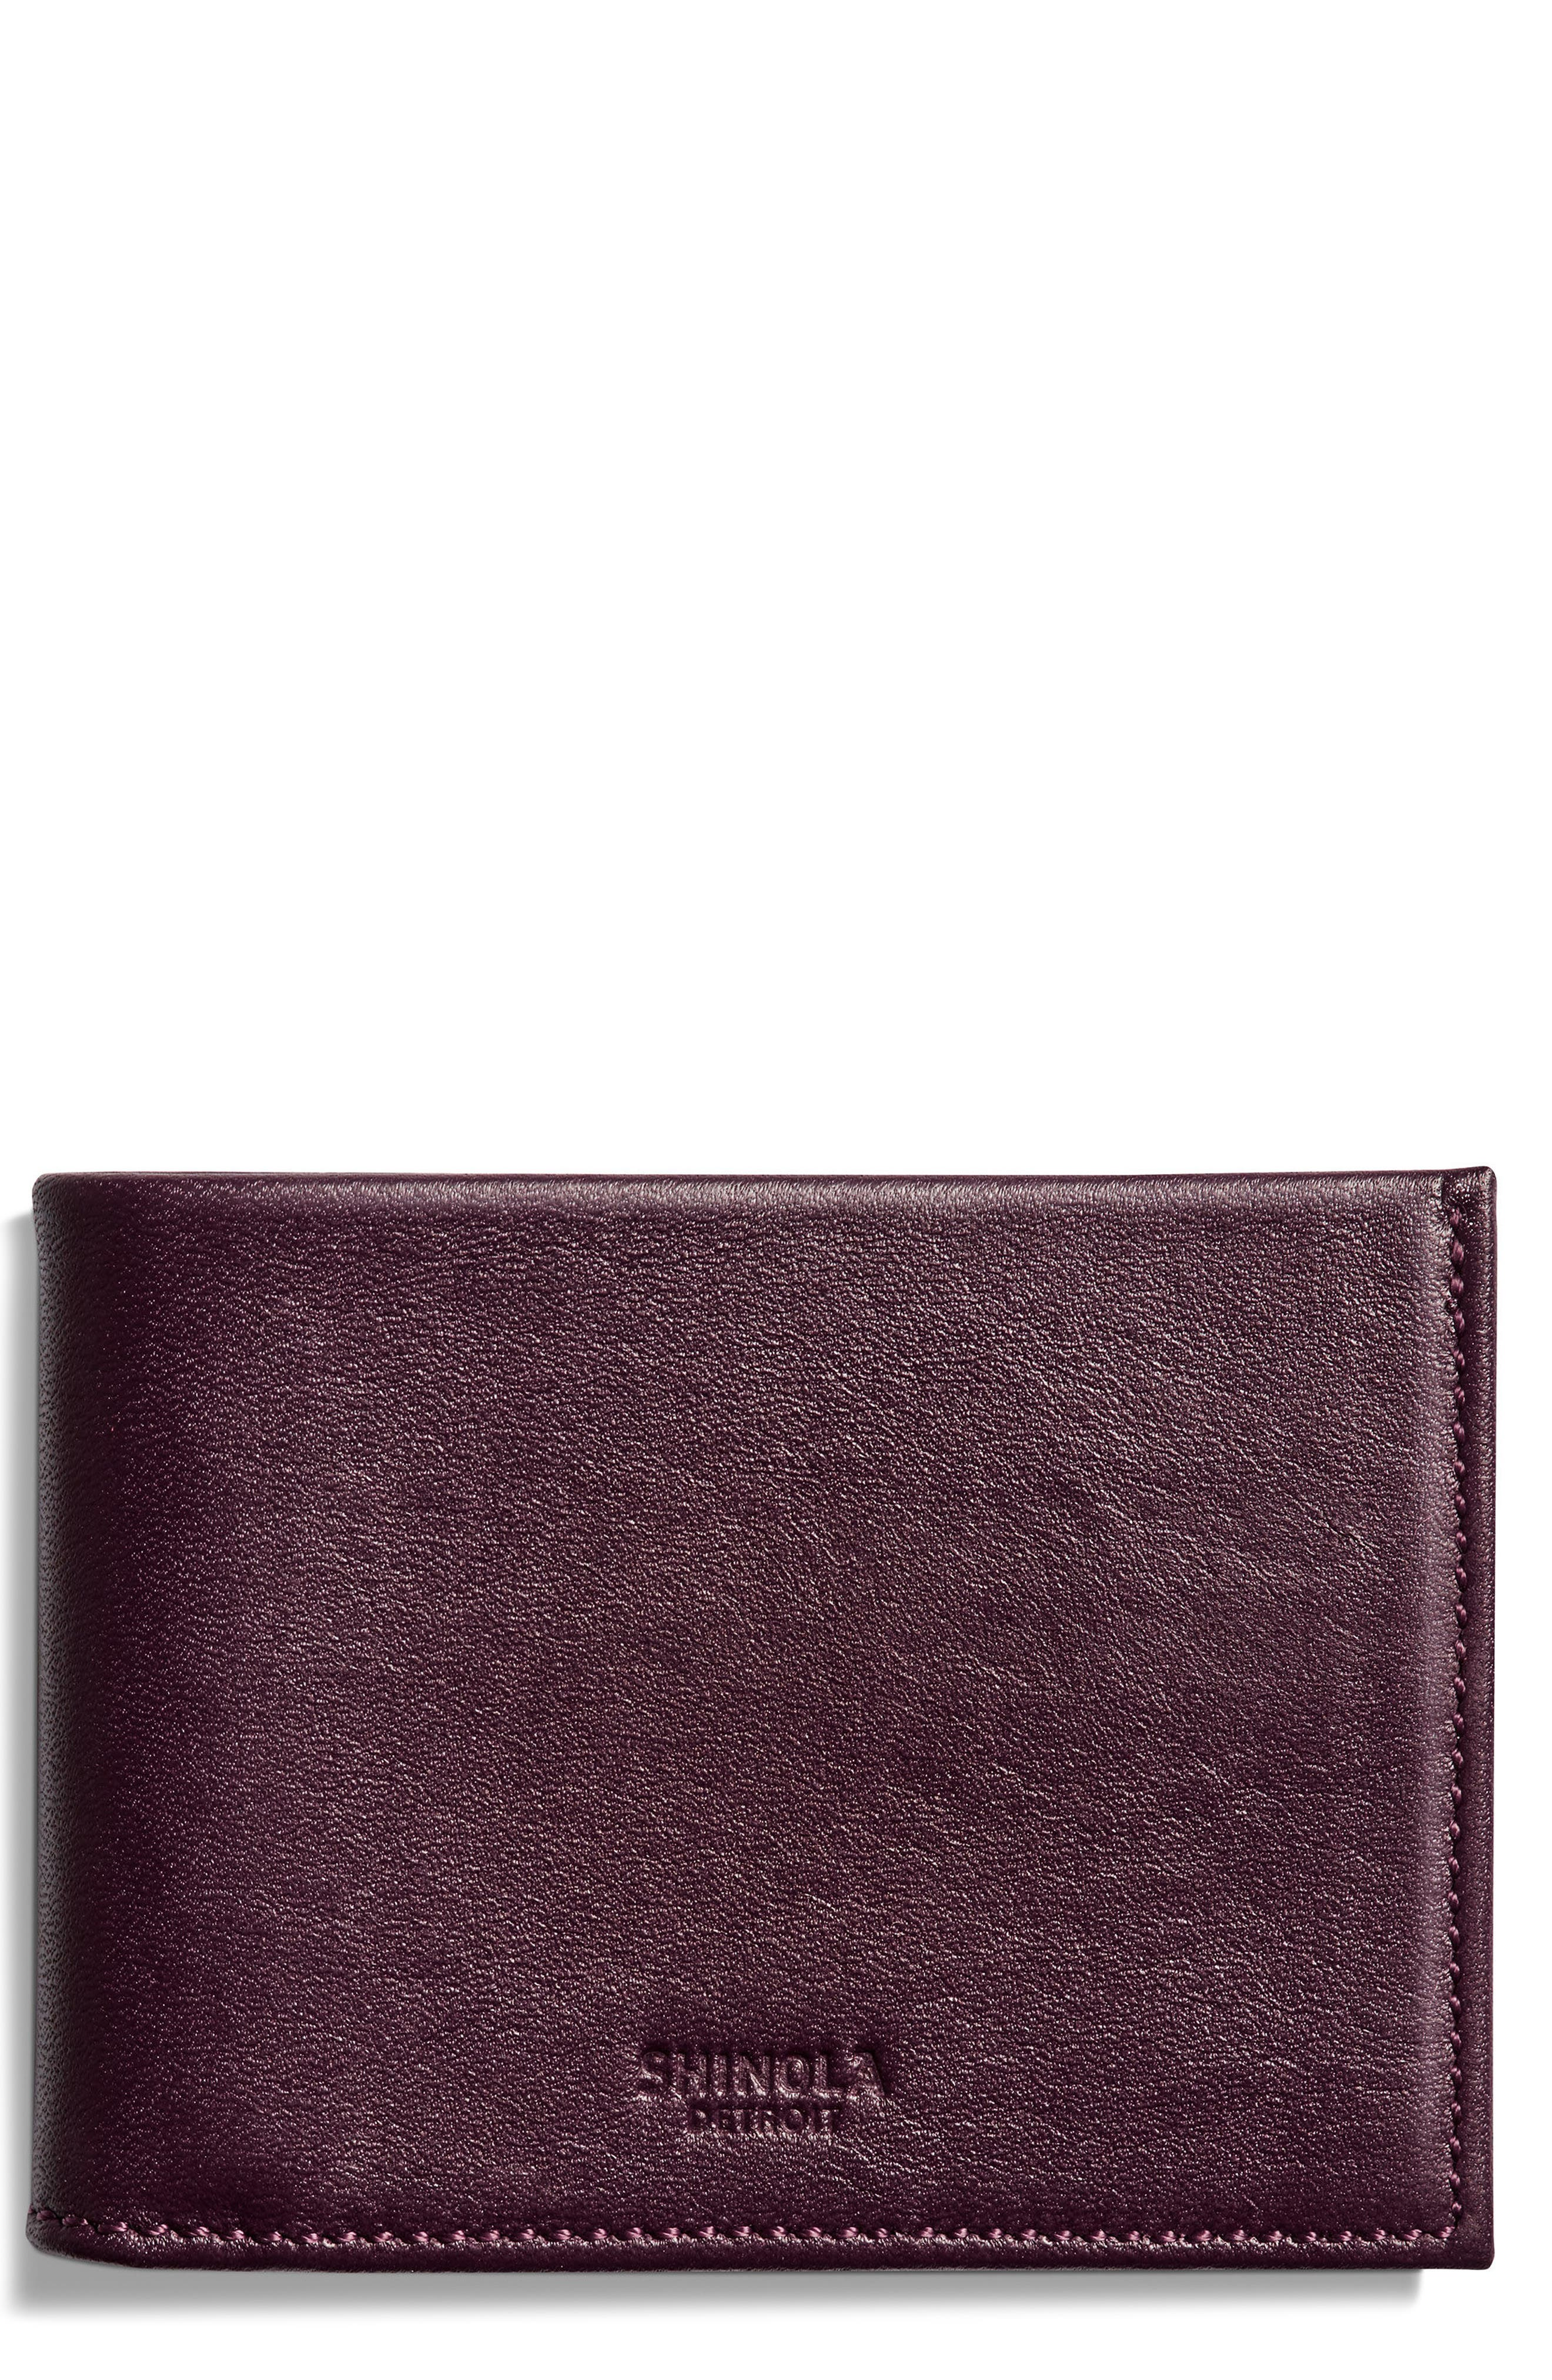 Slim Bifold Leather Wallet,                         Main,                         color, Bourbon